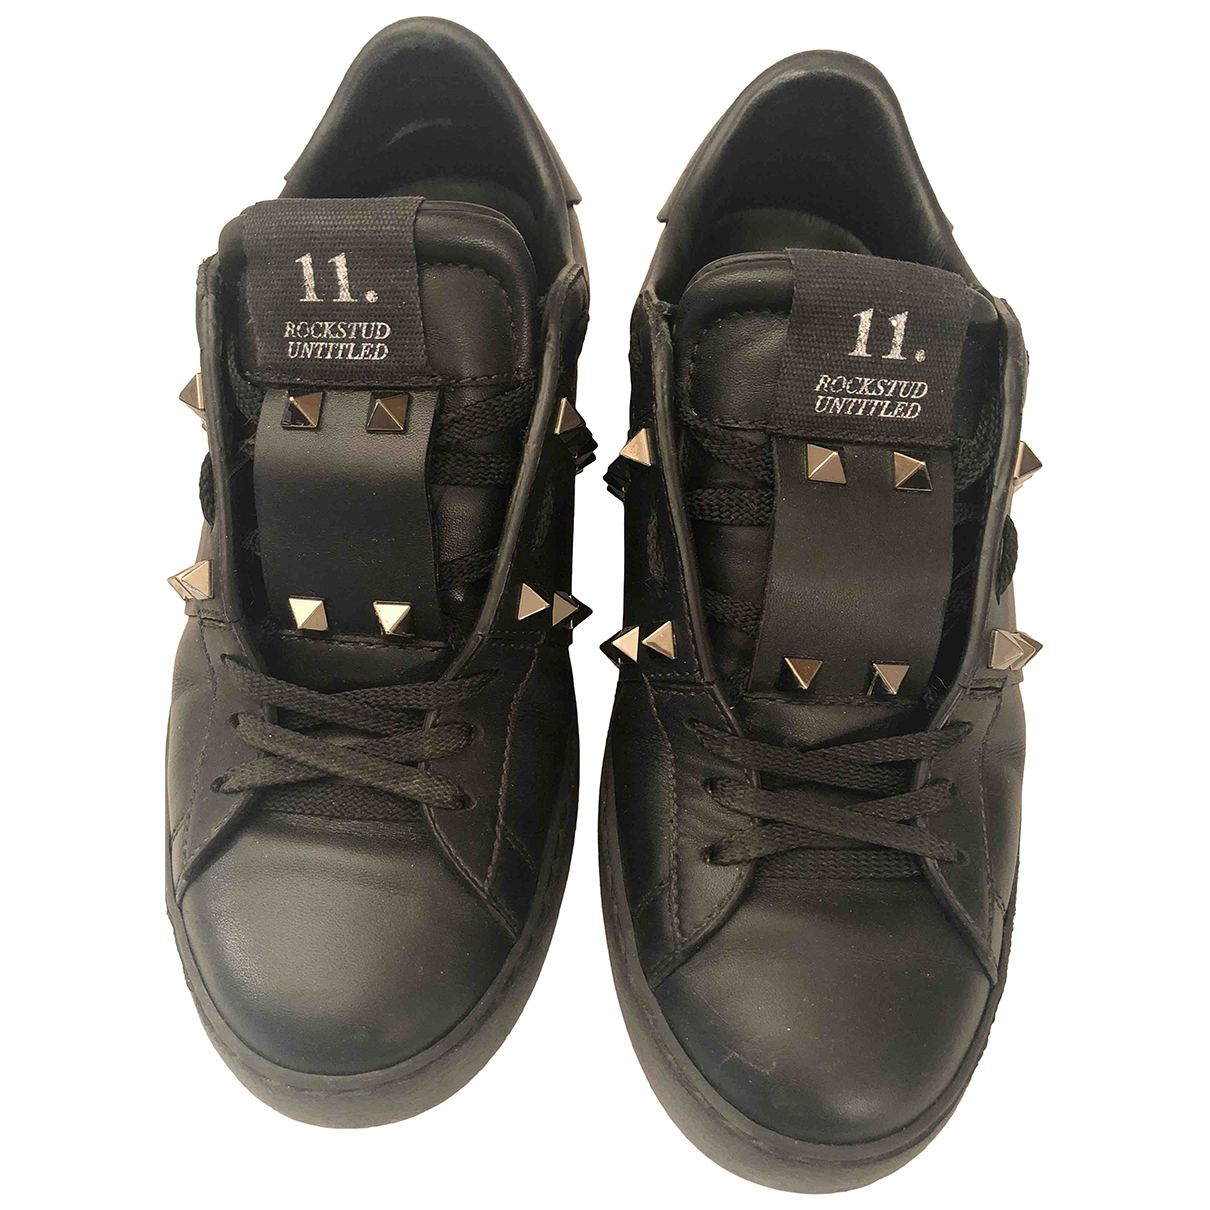 Valentino Garavani Rockstud Black Leather Trainers for Women 36.5 EU